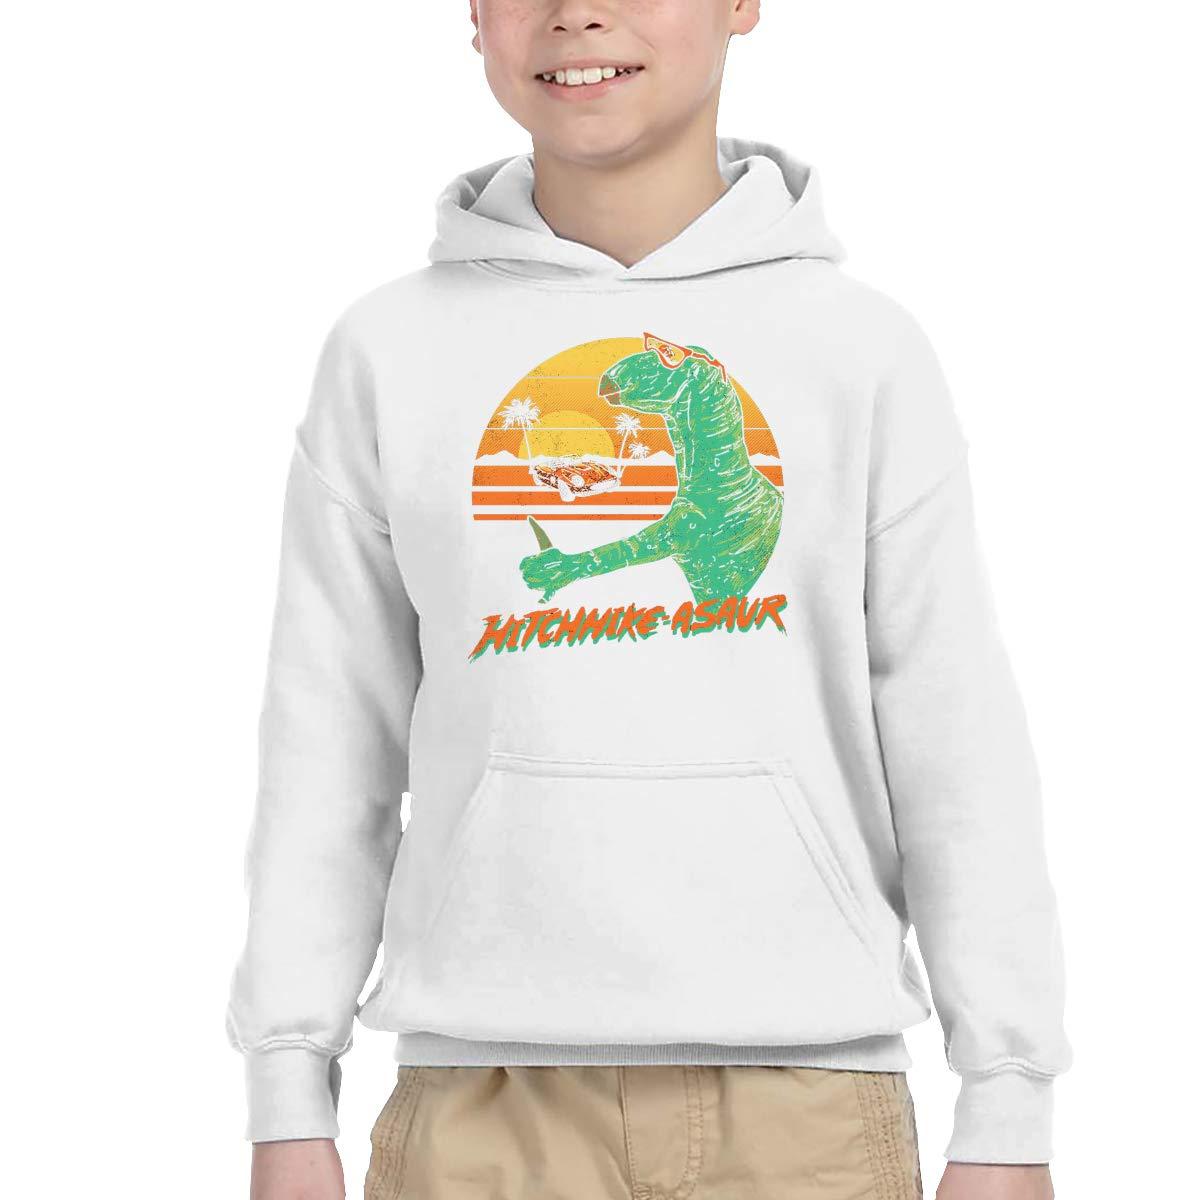 Sakanpo Hitchhike-Asaur Pullover Hoodie Sweatshirt Teens Hooded for Boys Girls